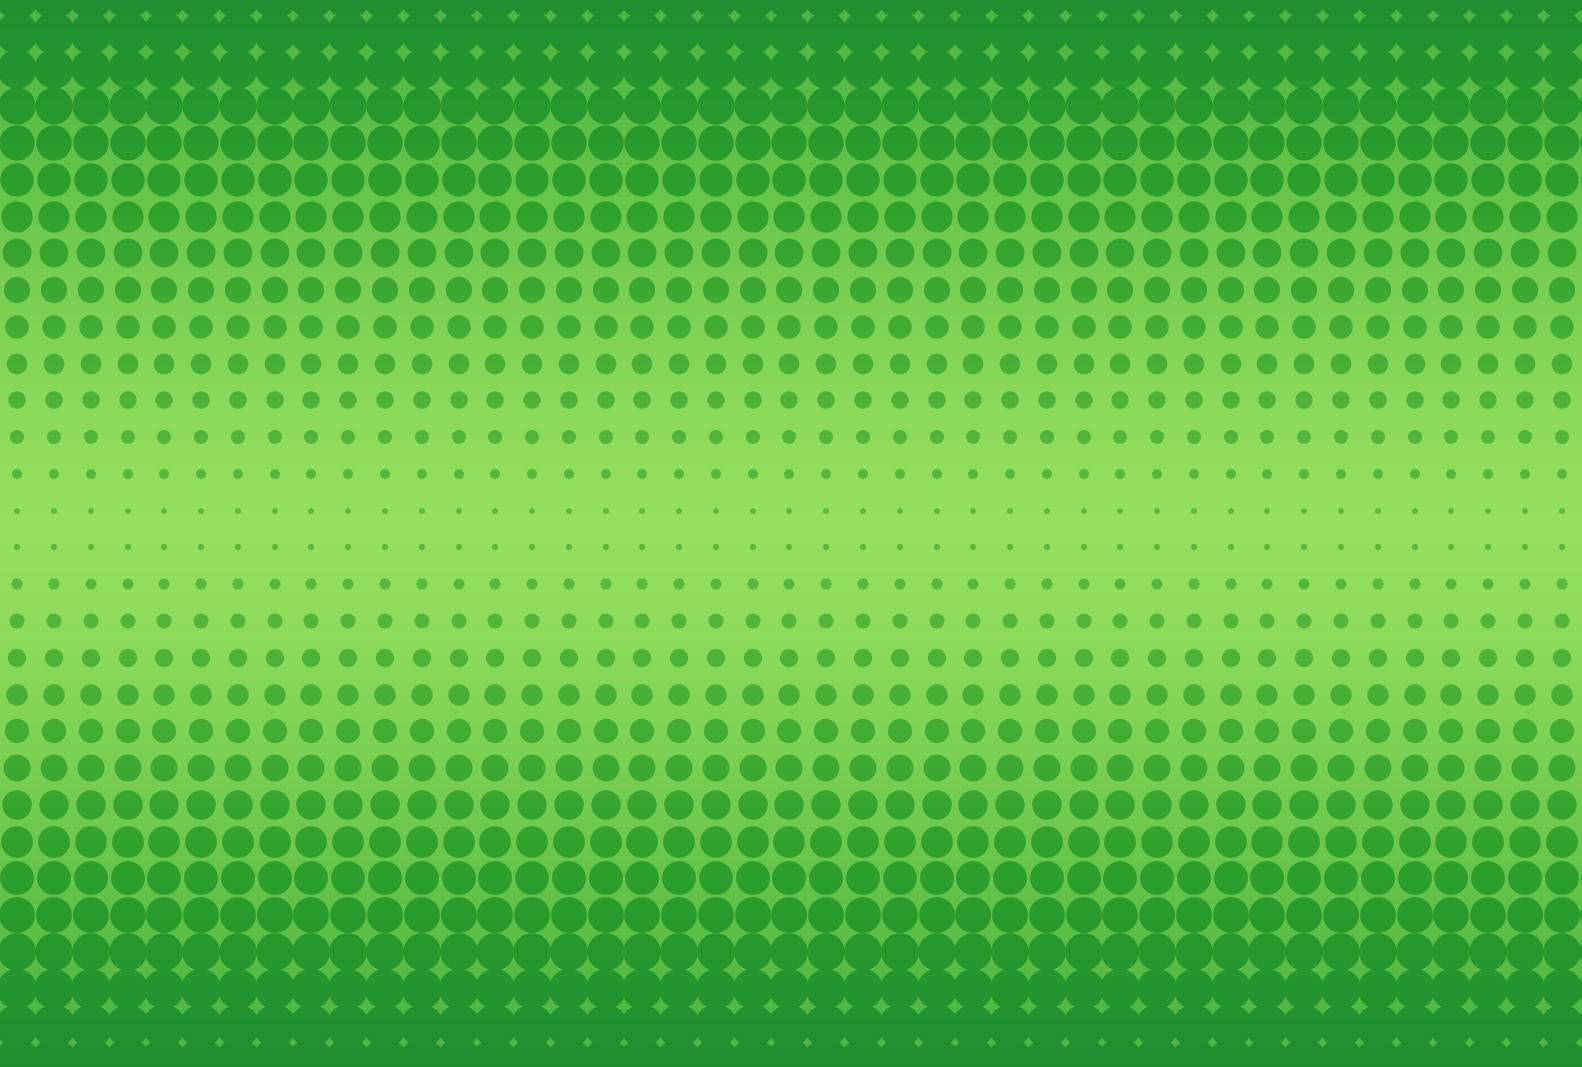 Green halftone background photo